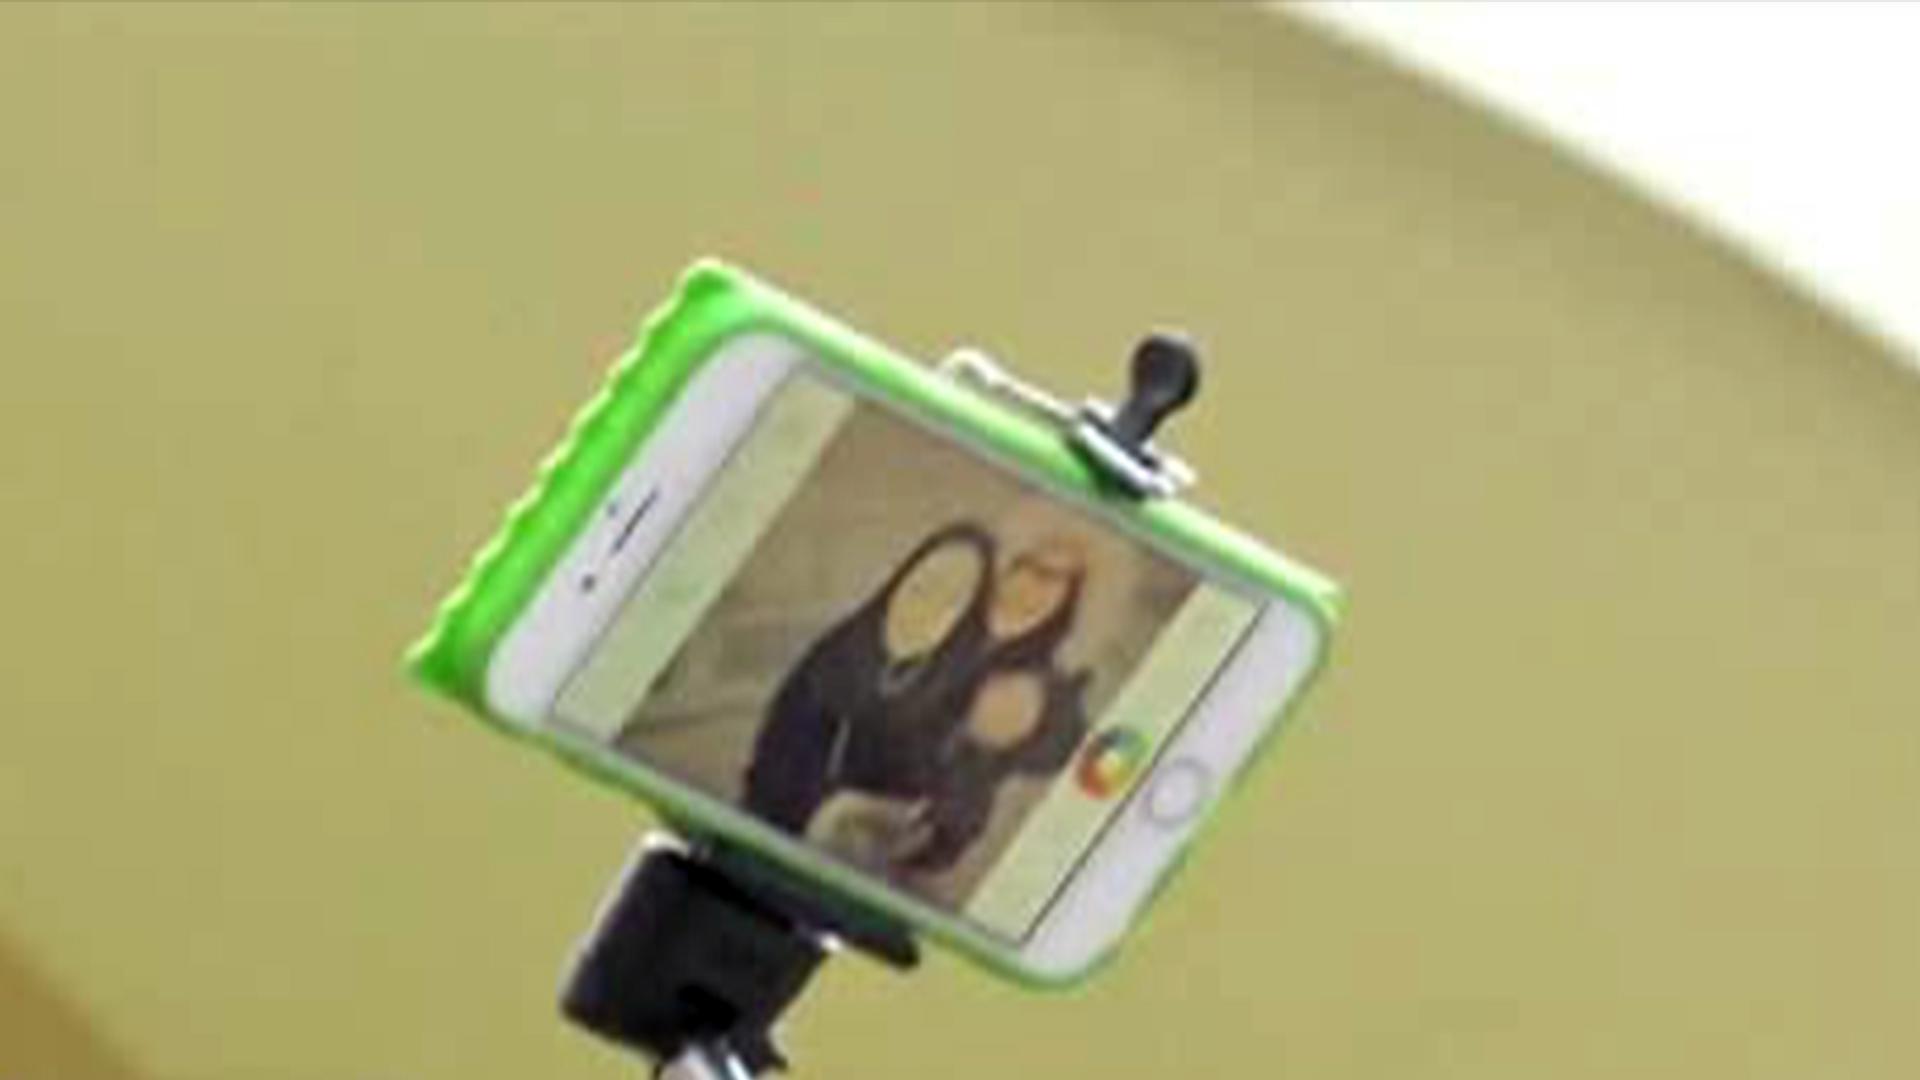 South Korea Selfie Stick Ban Goes Into Effect